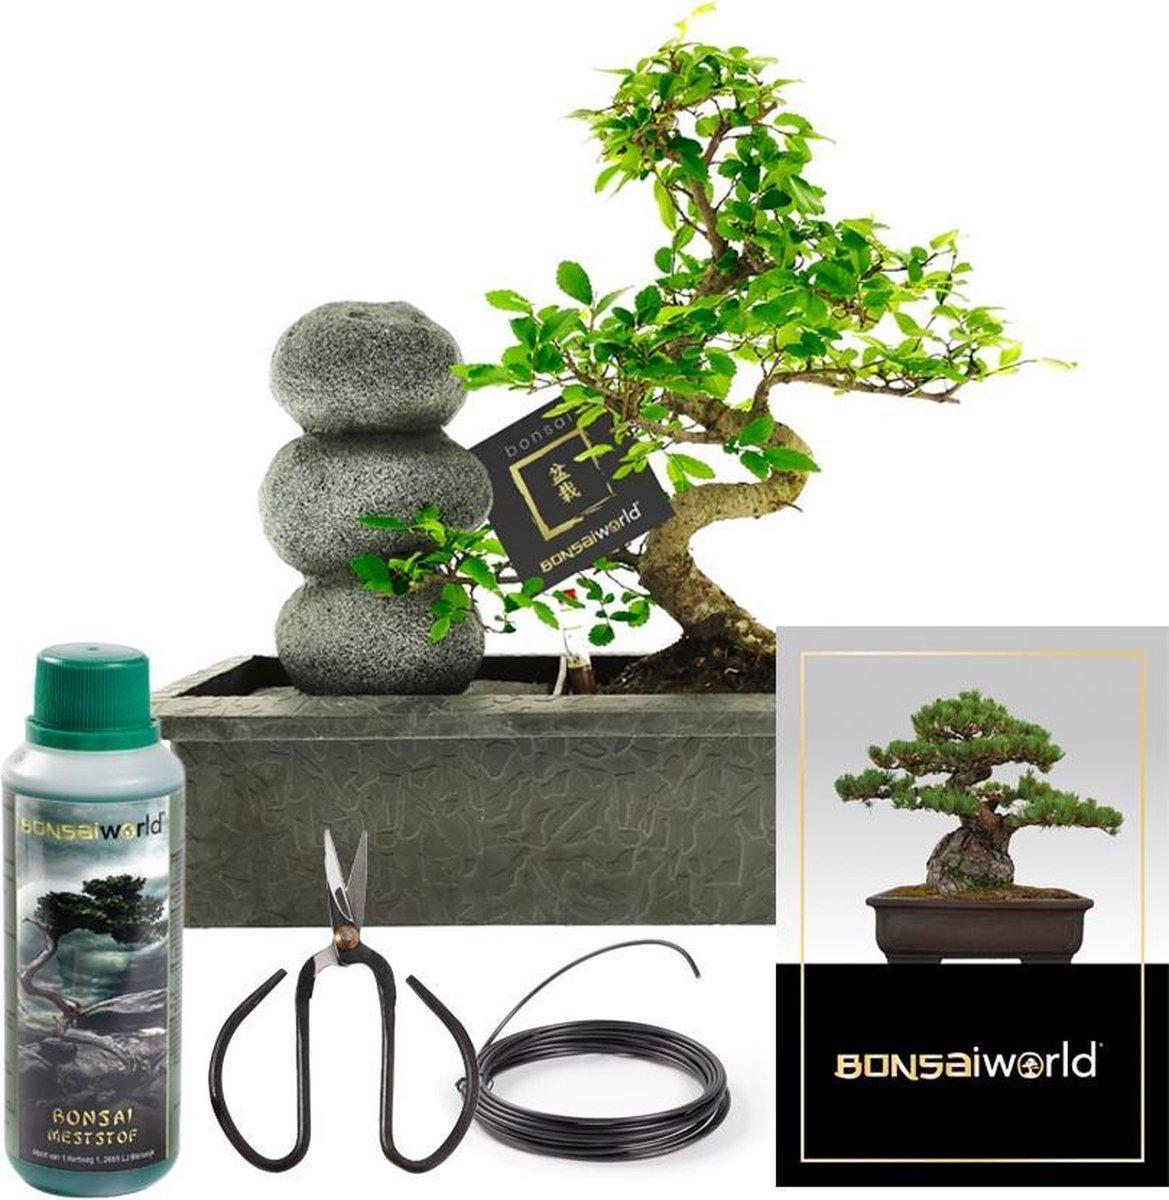 Bonsaiworld Bonsai Zen Stenen Waterval Set - Bonsai Starters Kit - Bonsai Boompje is 10 jaar oud - Hoogte️ 30-35 cm + Verzorgingskit - Bonsai- Schaar,